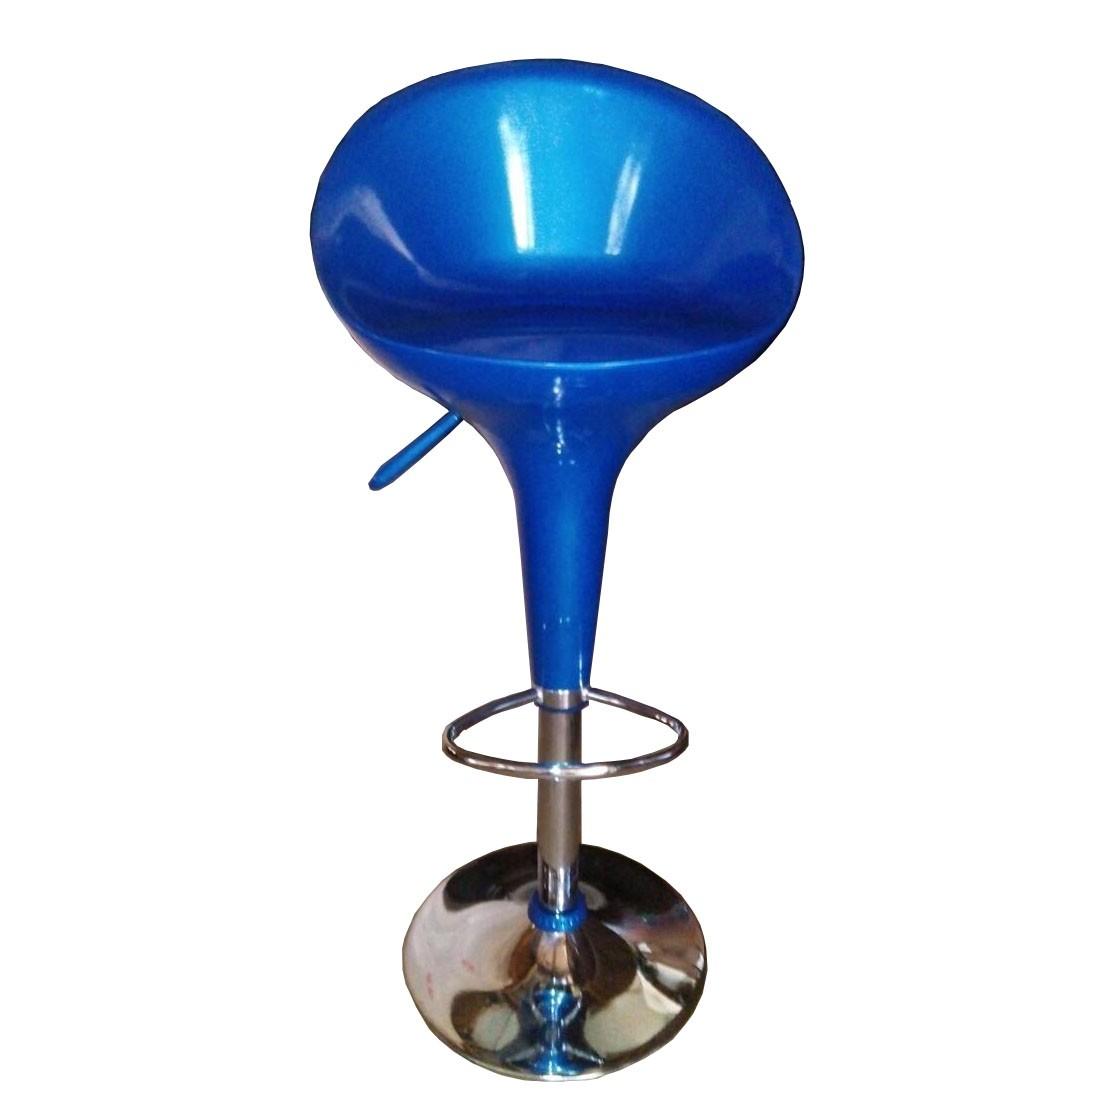 Bar Stool For Sale Plastic Swivel Seat Height